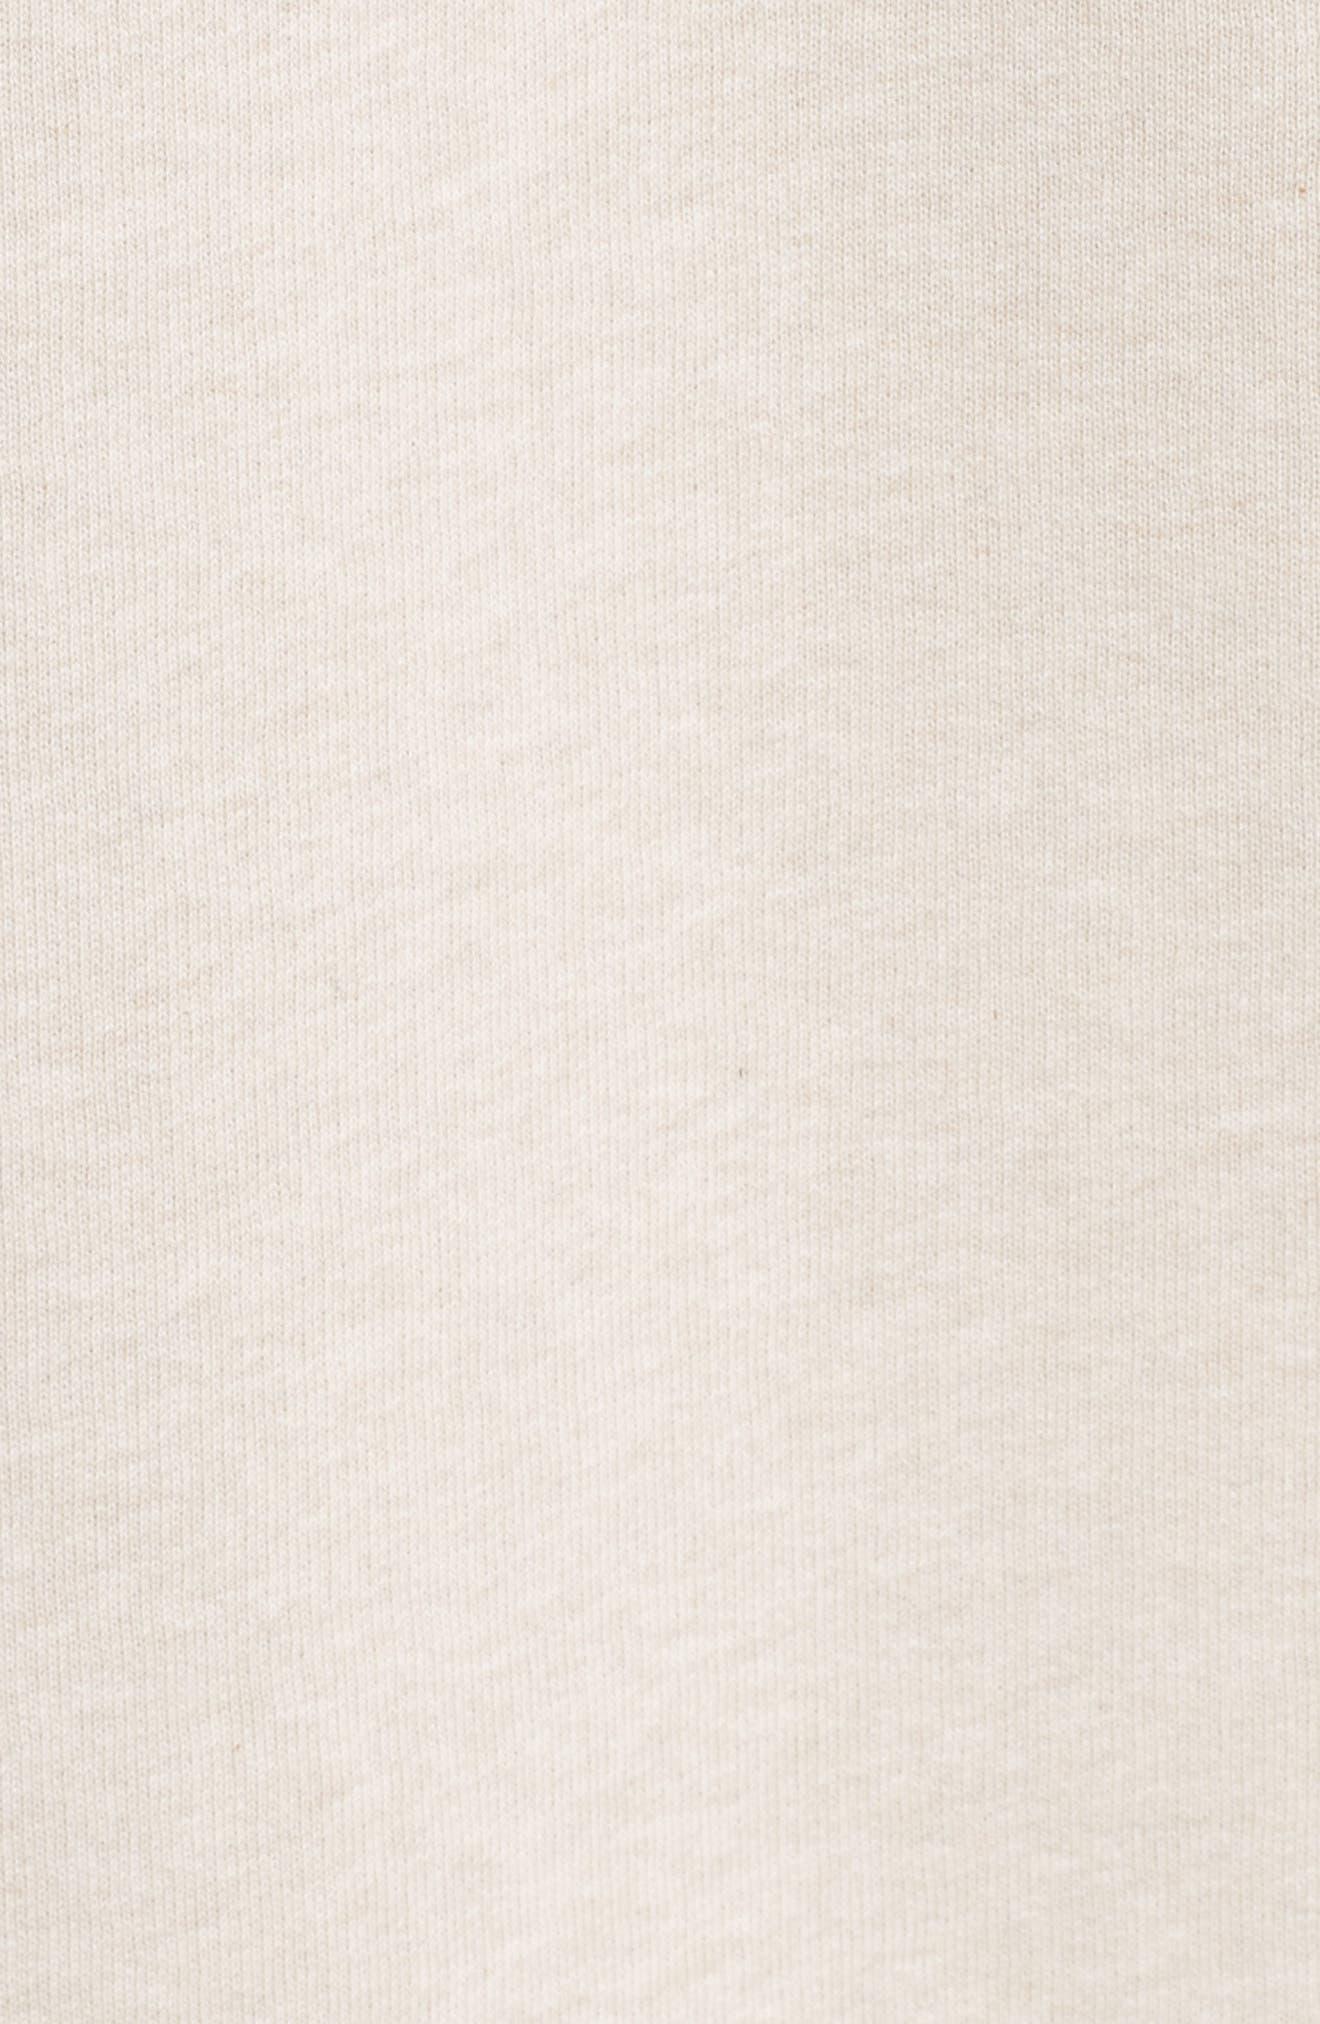 Taro Sweatshirt Dress,                             Alternate thumbnail 5, color,                             250